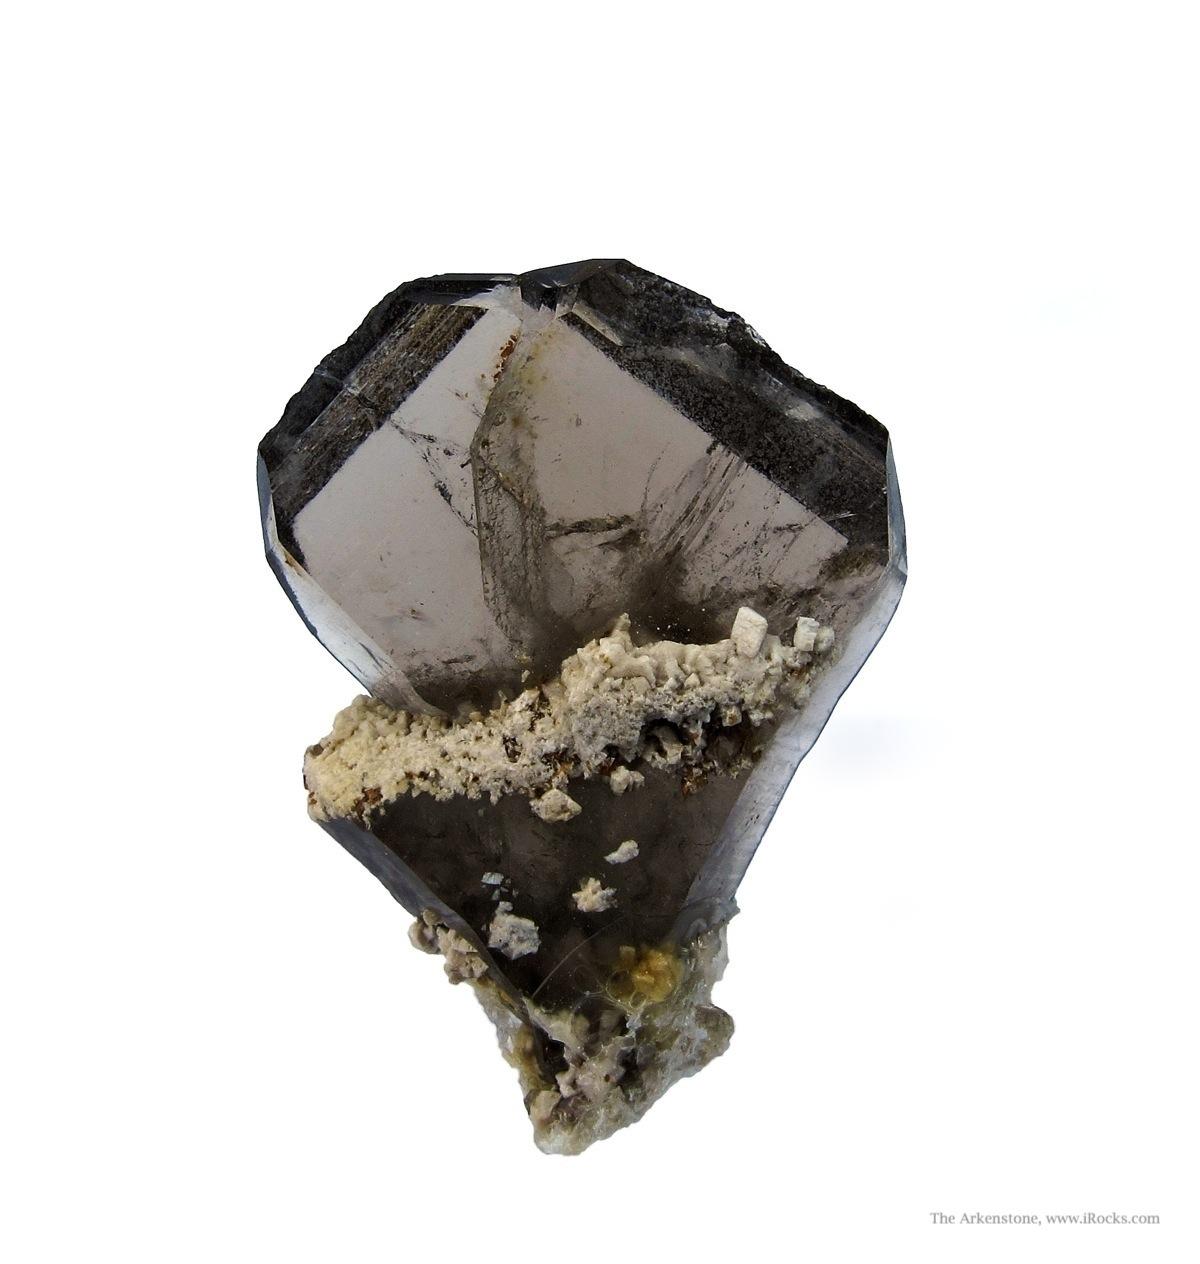 A MAJOR thumbnail specimen great iconic finds quartz time Originally